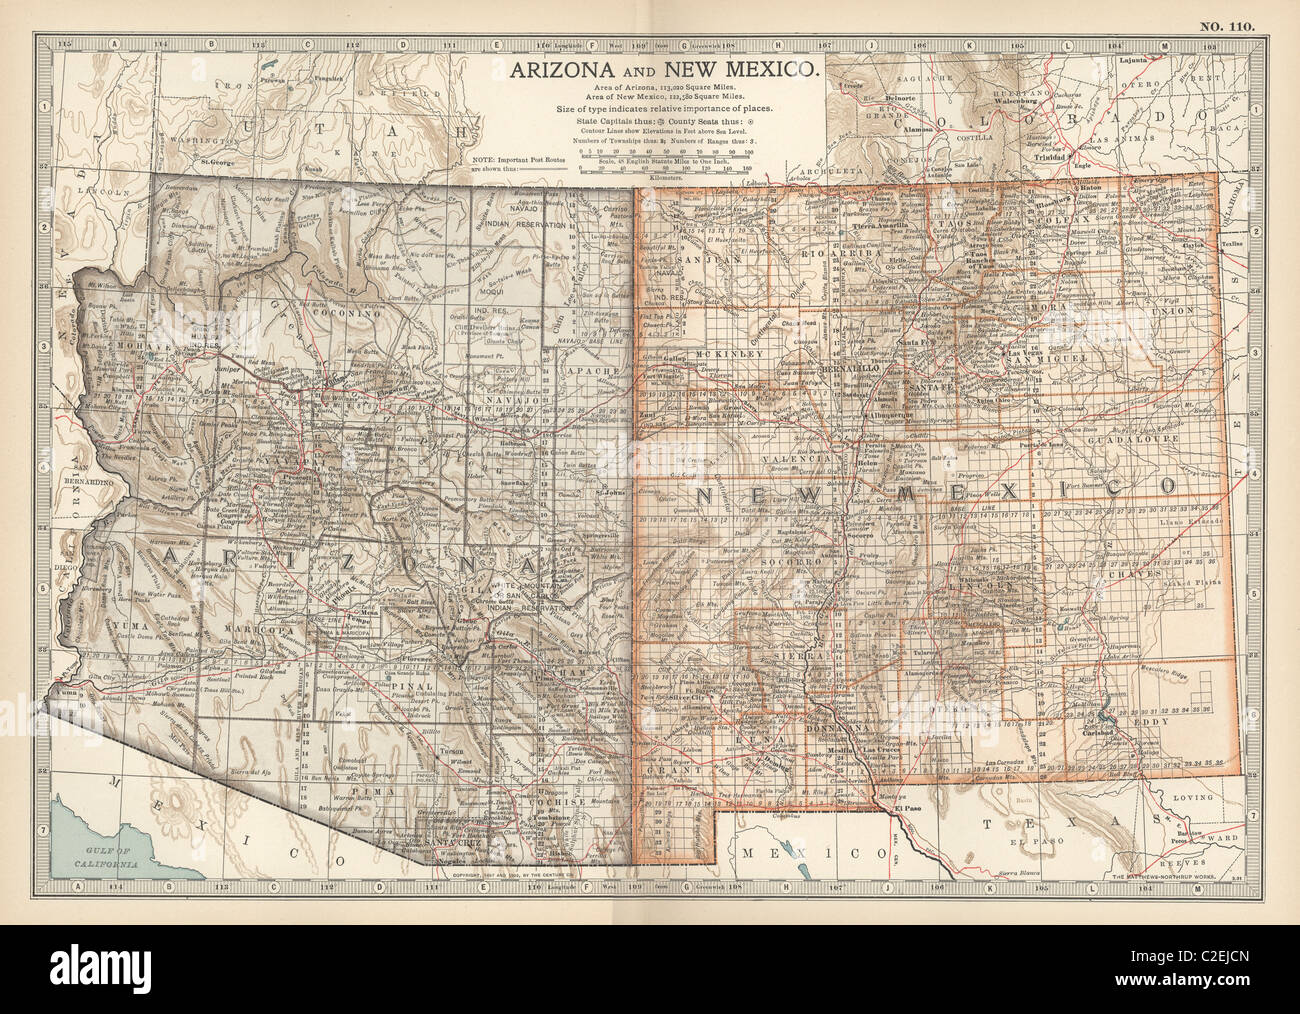 Map of Arizona and New Mexico Stock Photo: 35971845 - Alamy